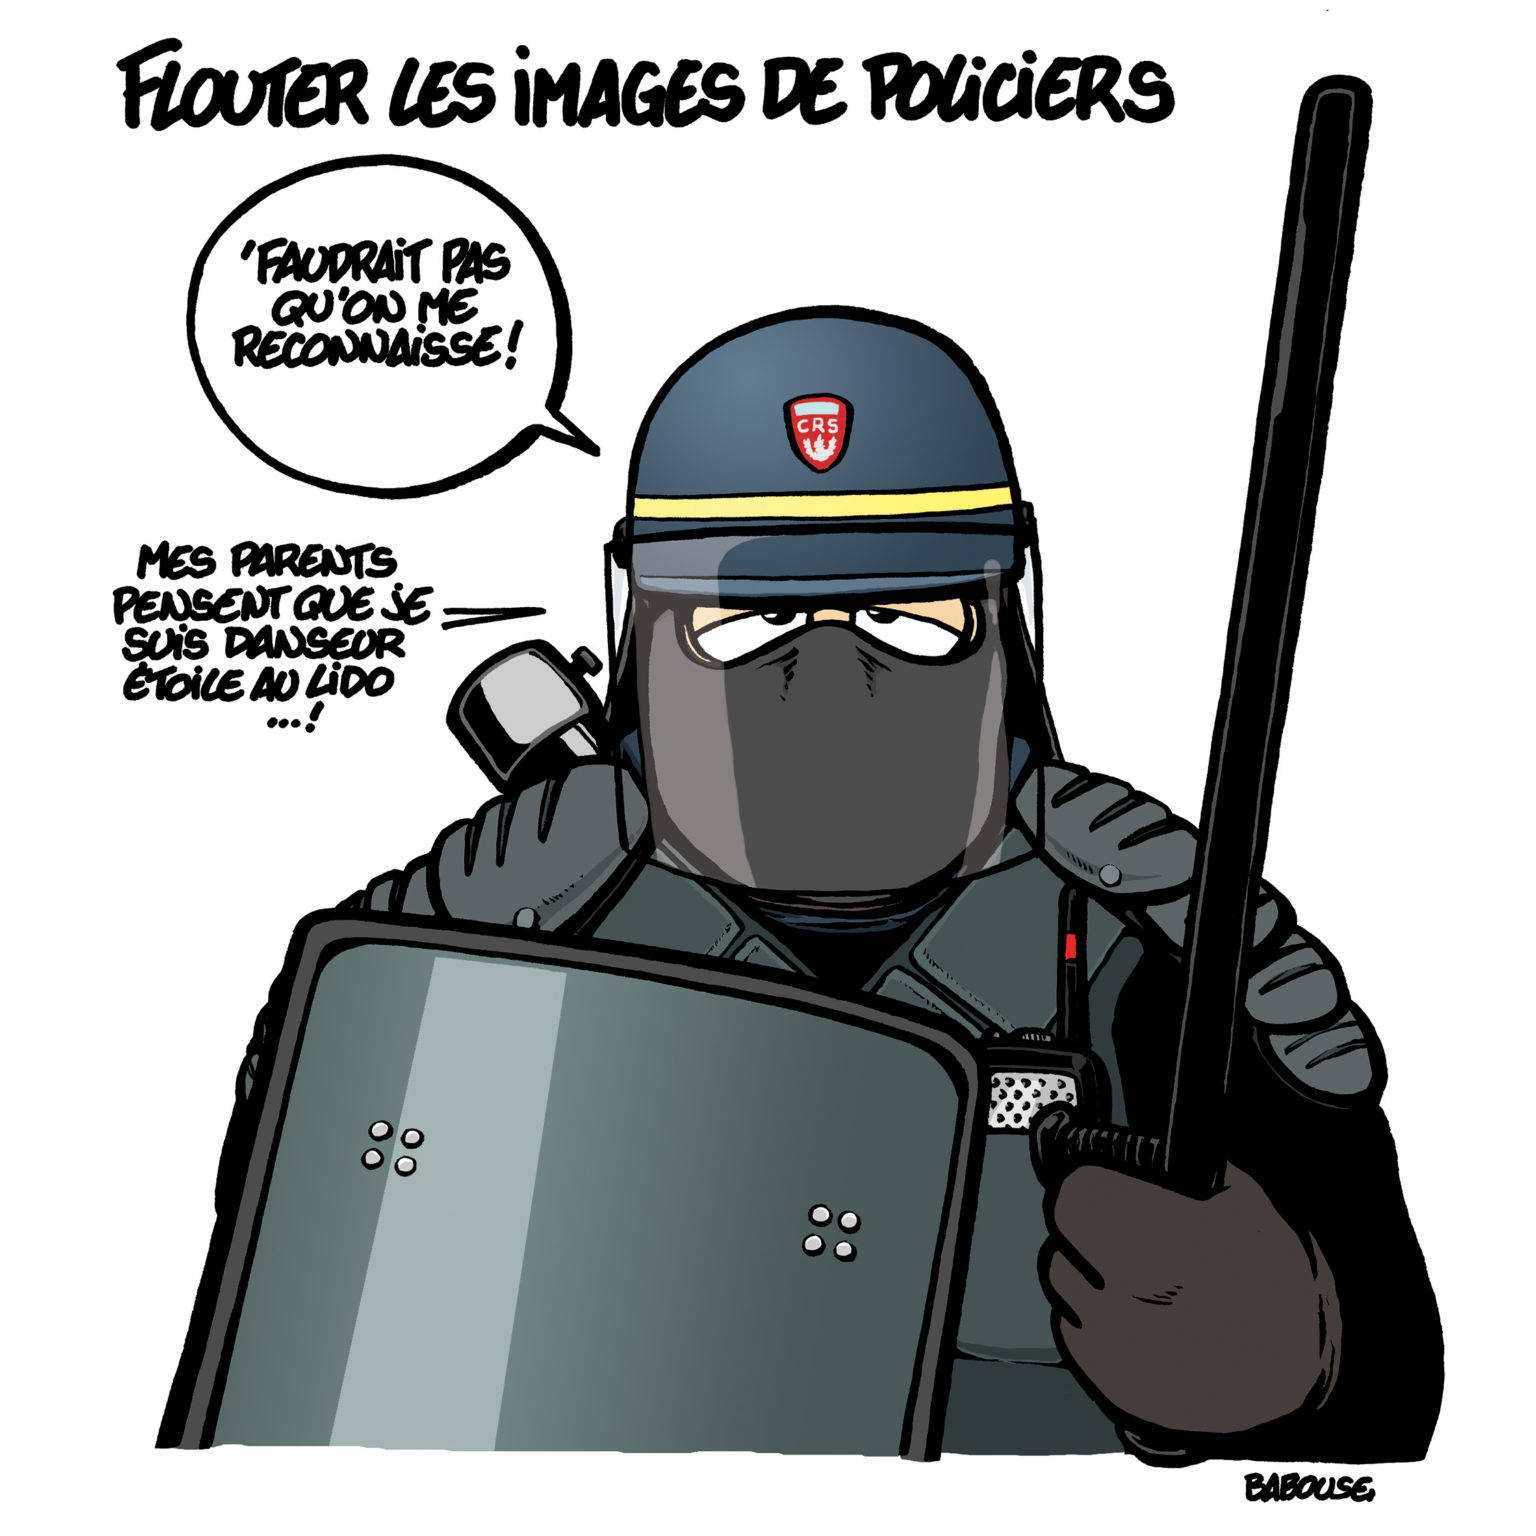 h11-flouterpolice-1536x1536.jpg